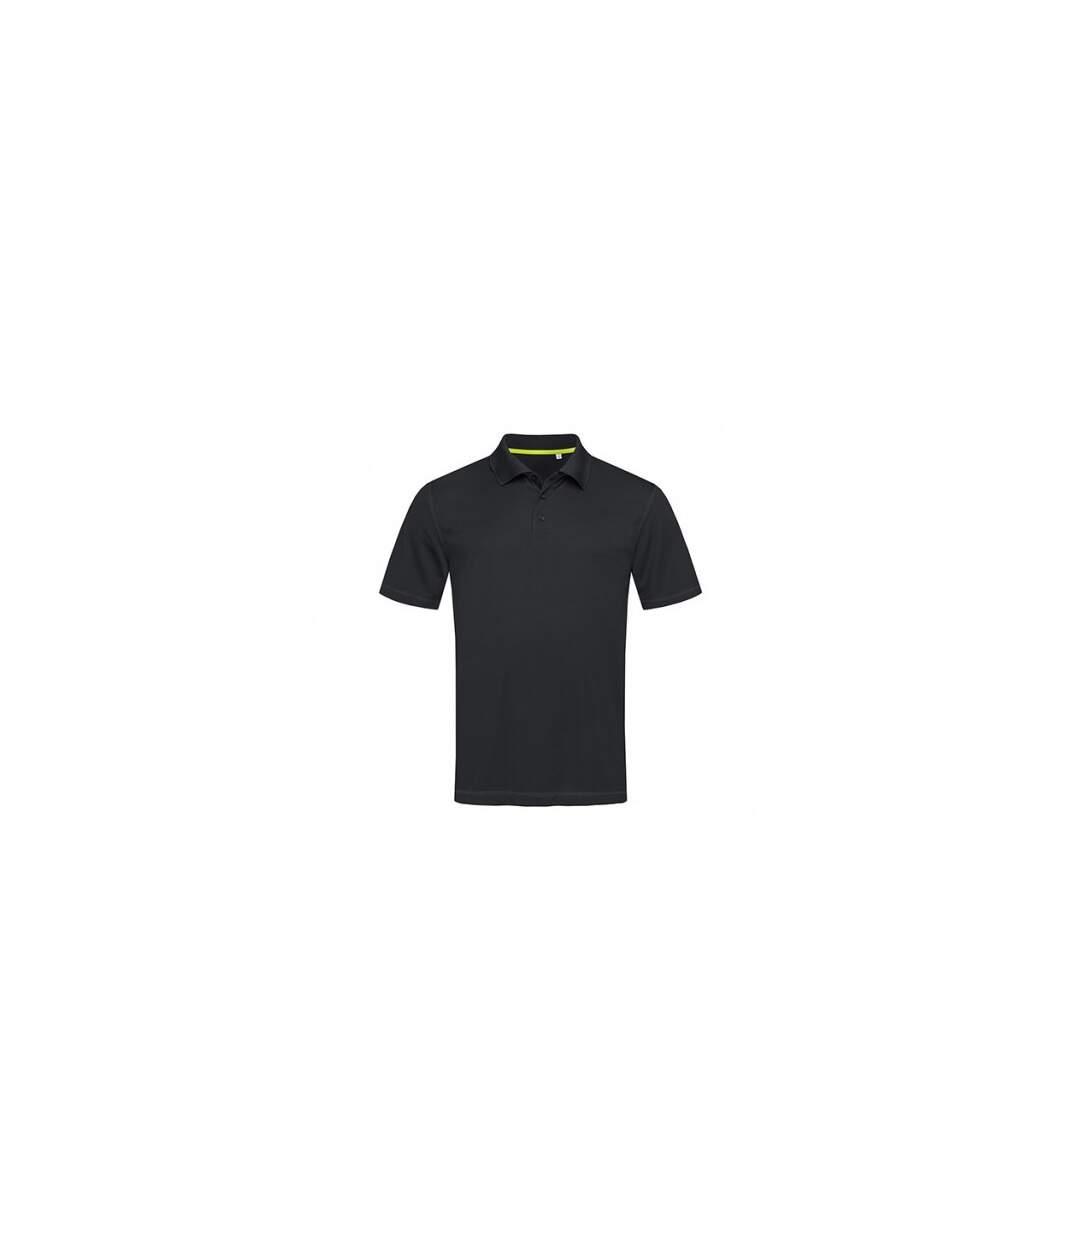 Stedman Mens Active 140 Mesh Polo (Black Opal) - UTAB346